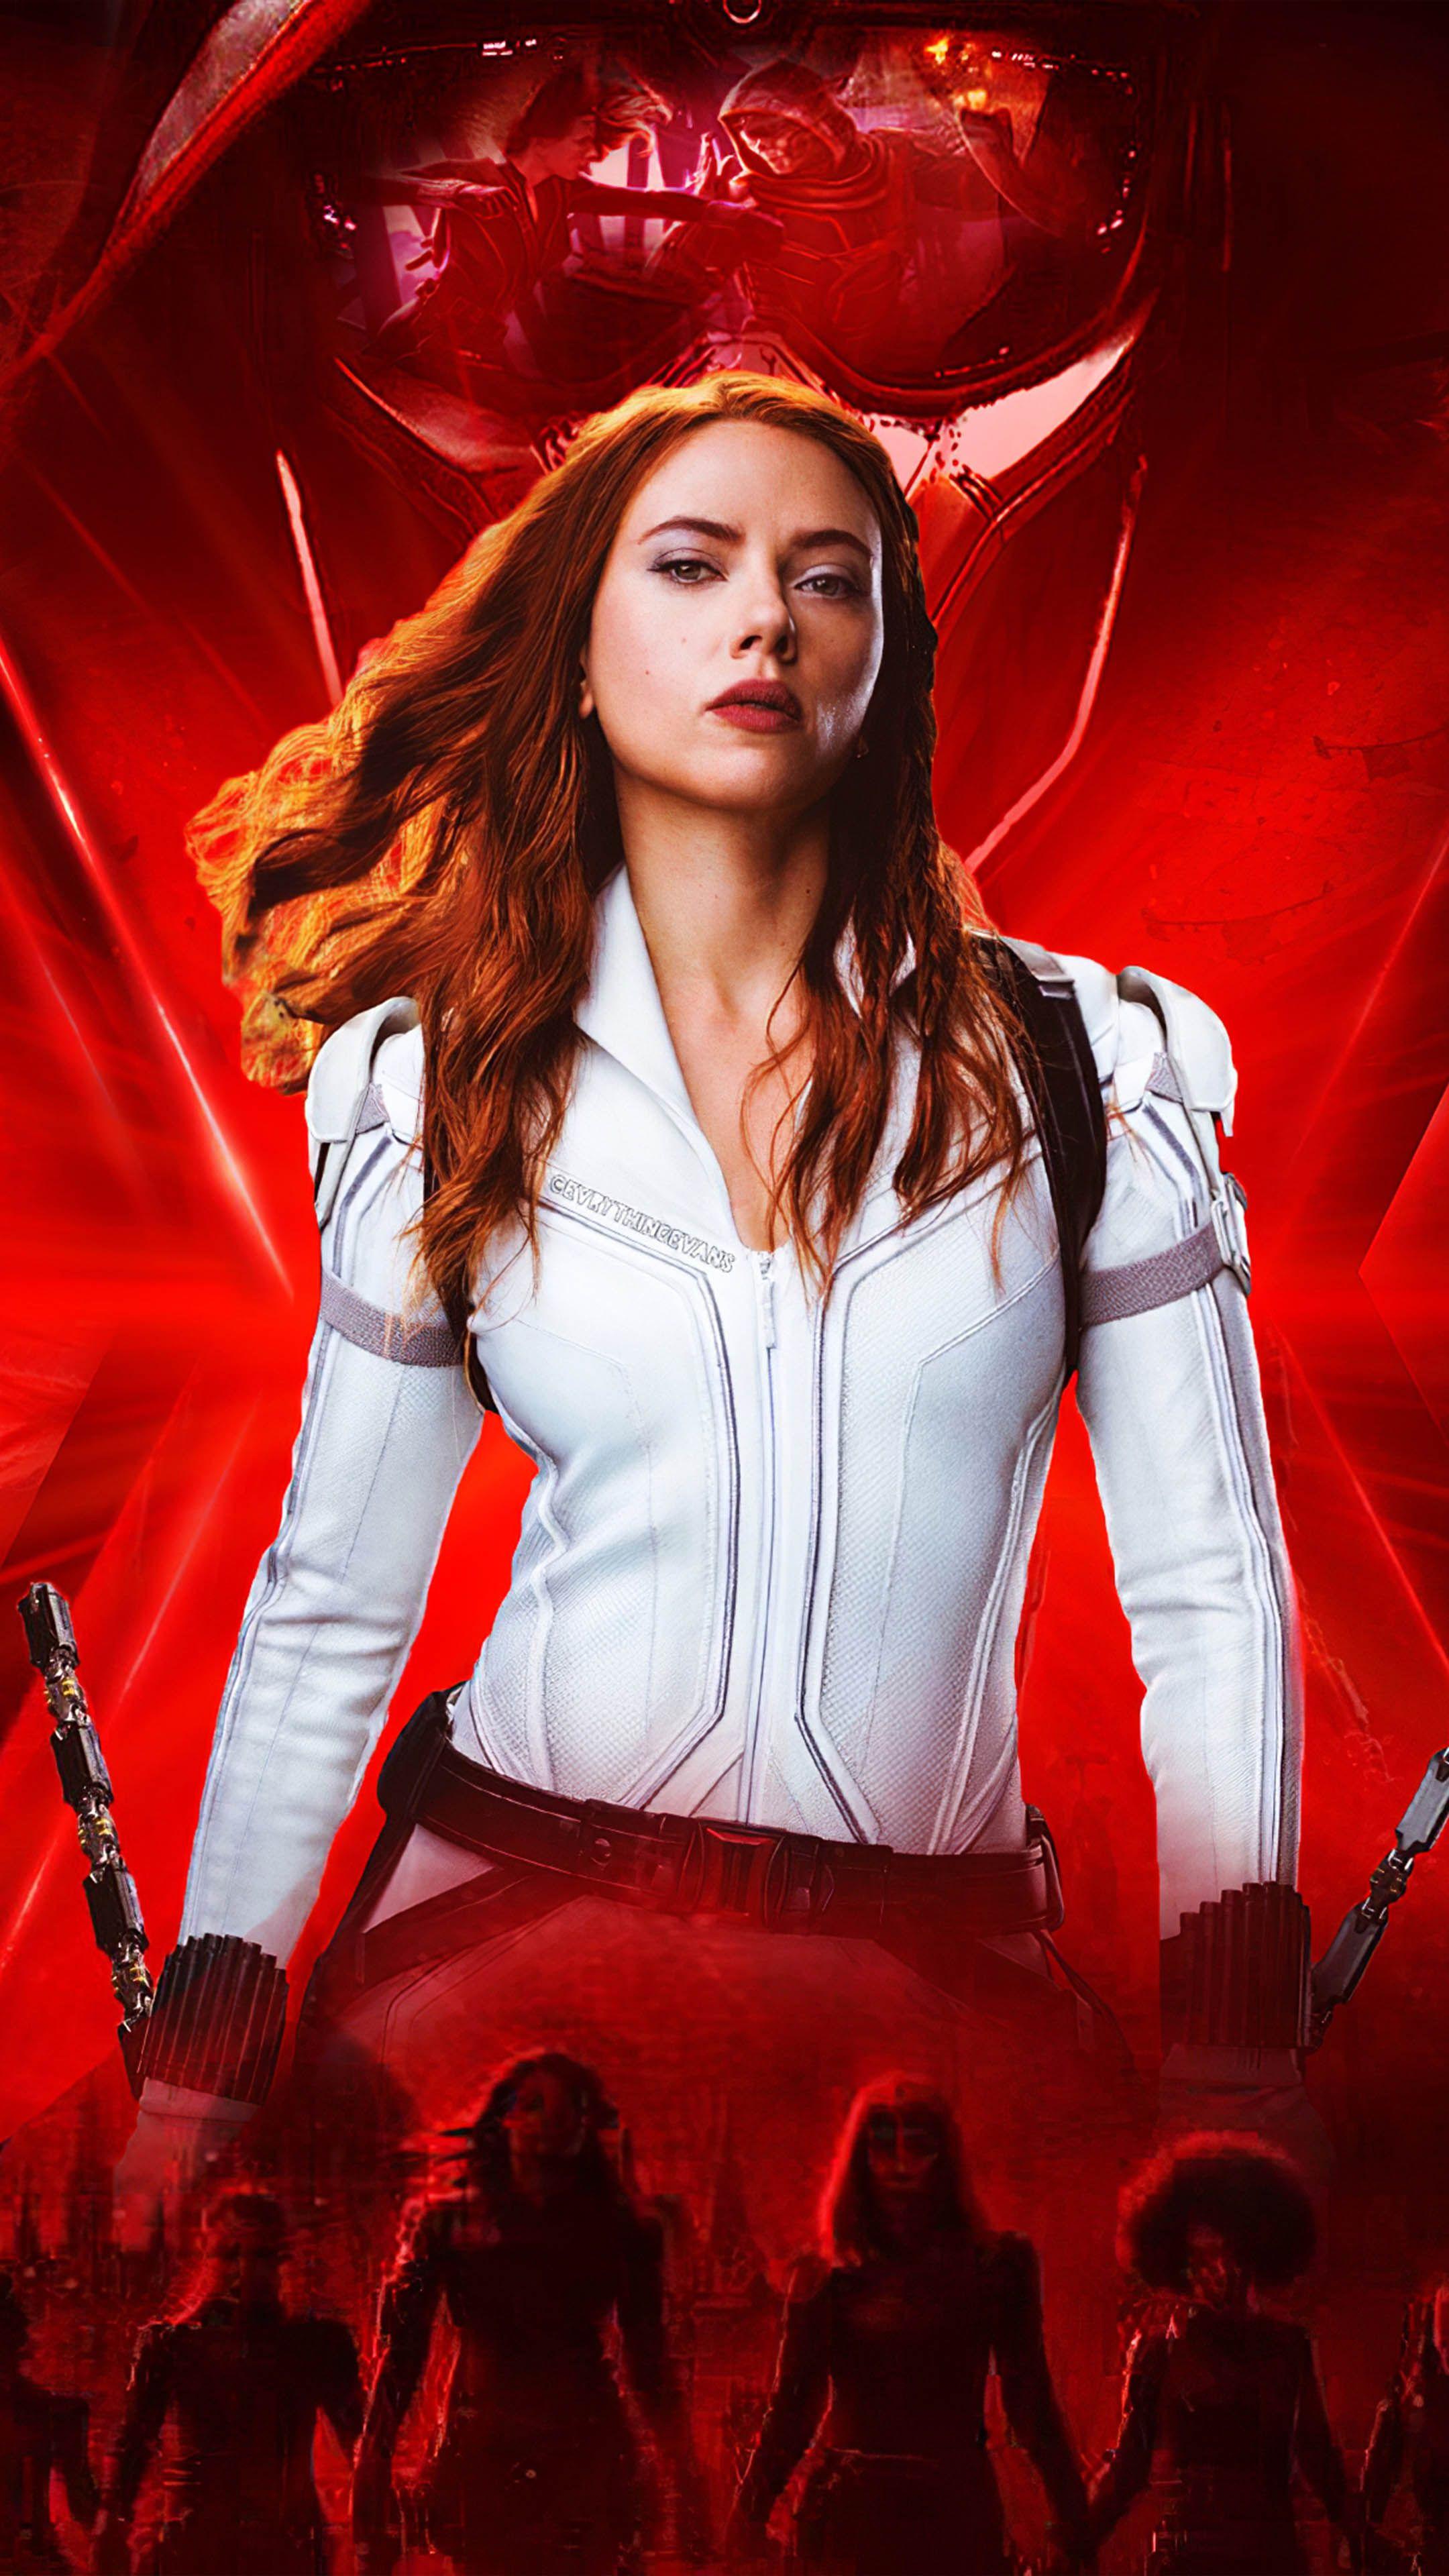 Black Widow 2020 Poster 4k Ultra Hd Mobile Wallpaper Black Widow Marvel Black Widow Movie Black Widow Avengers